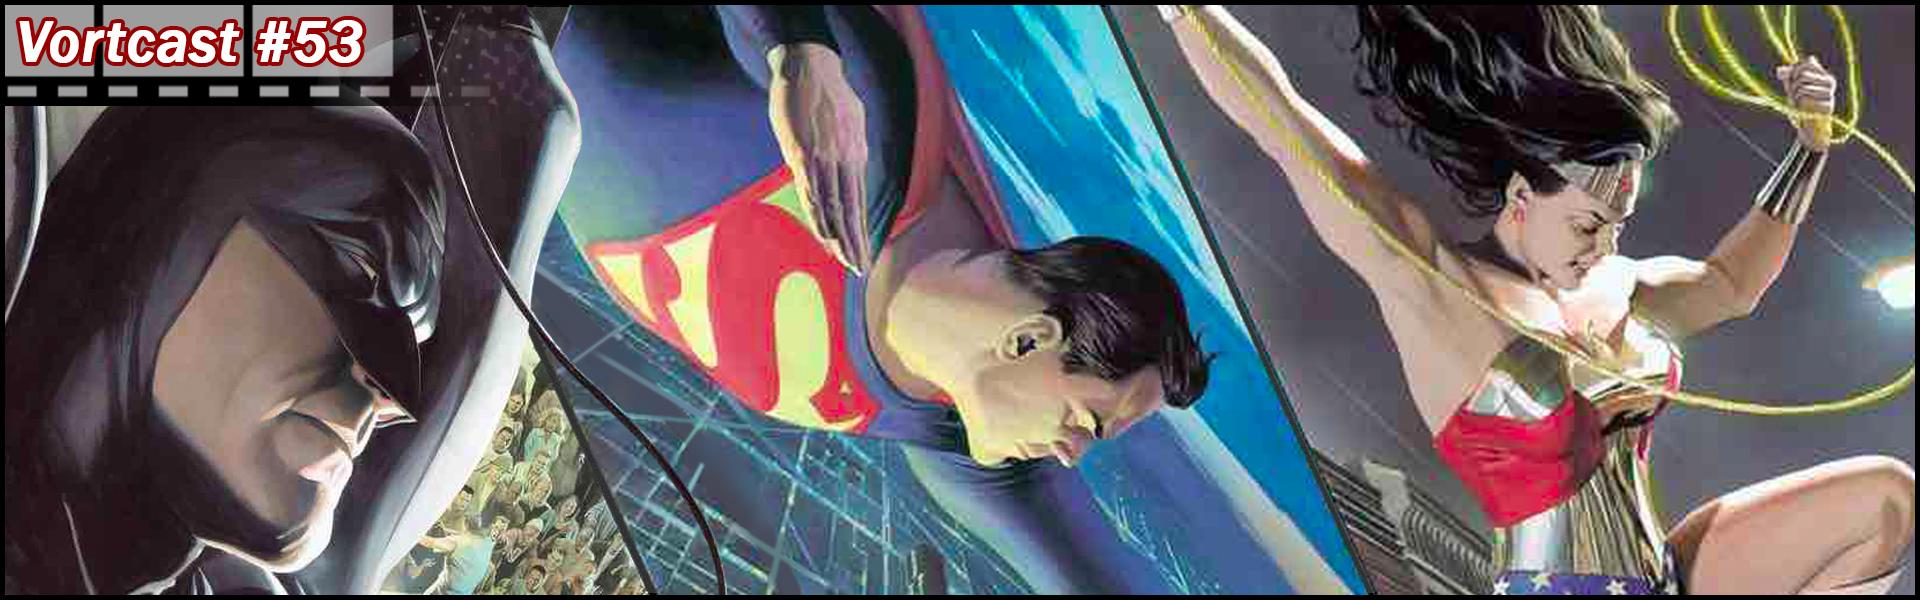 VortCast 53 | Trindade (DC Comics)